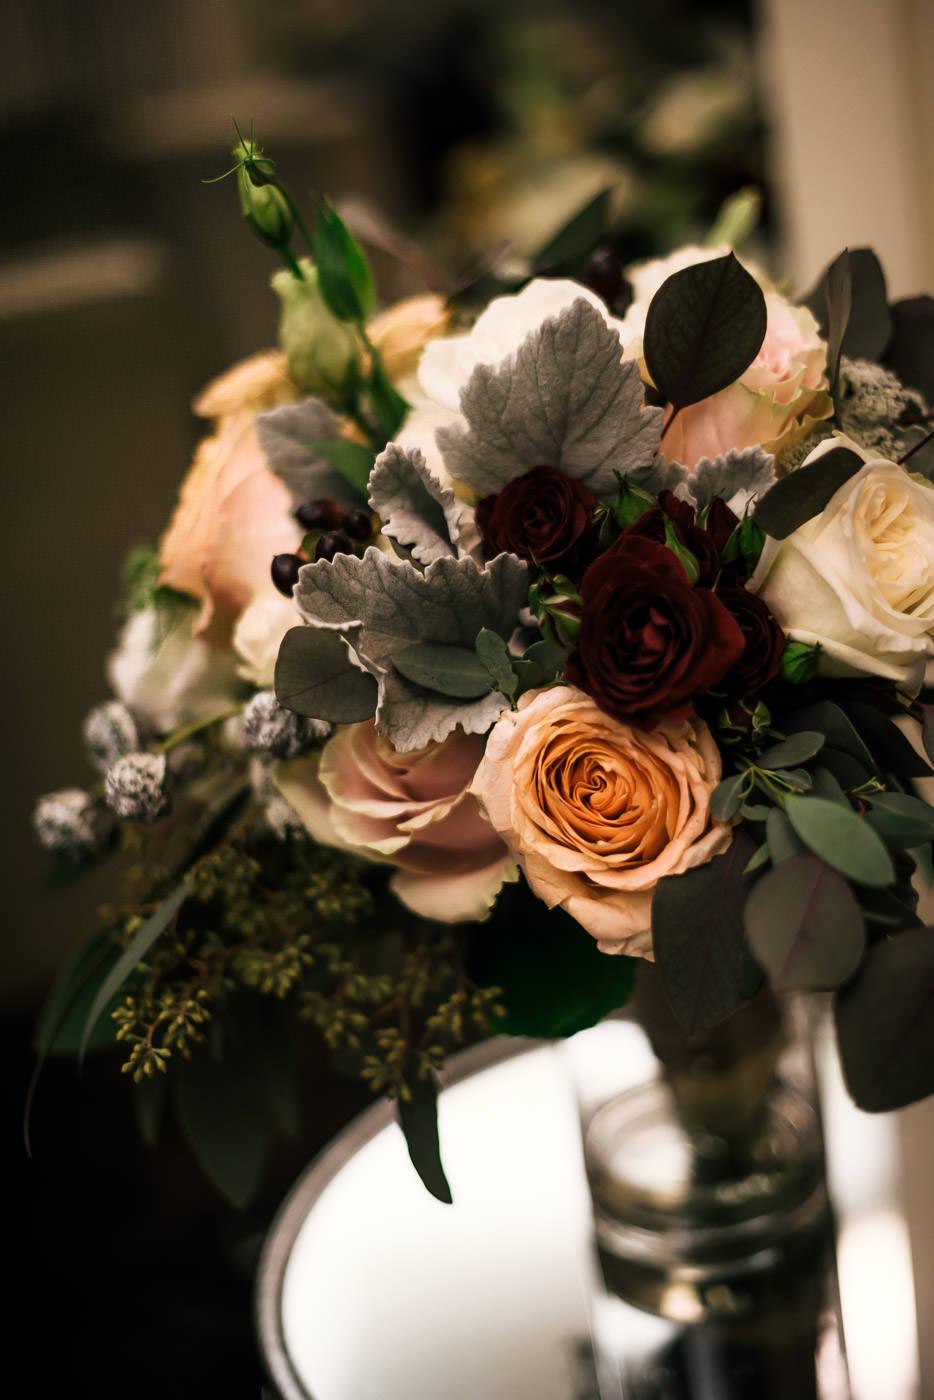 Gorgeous wedding bouquet in a vase.